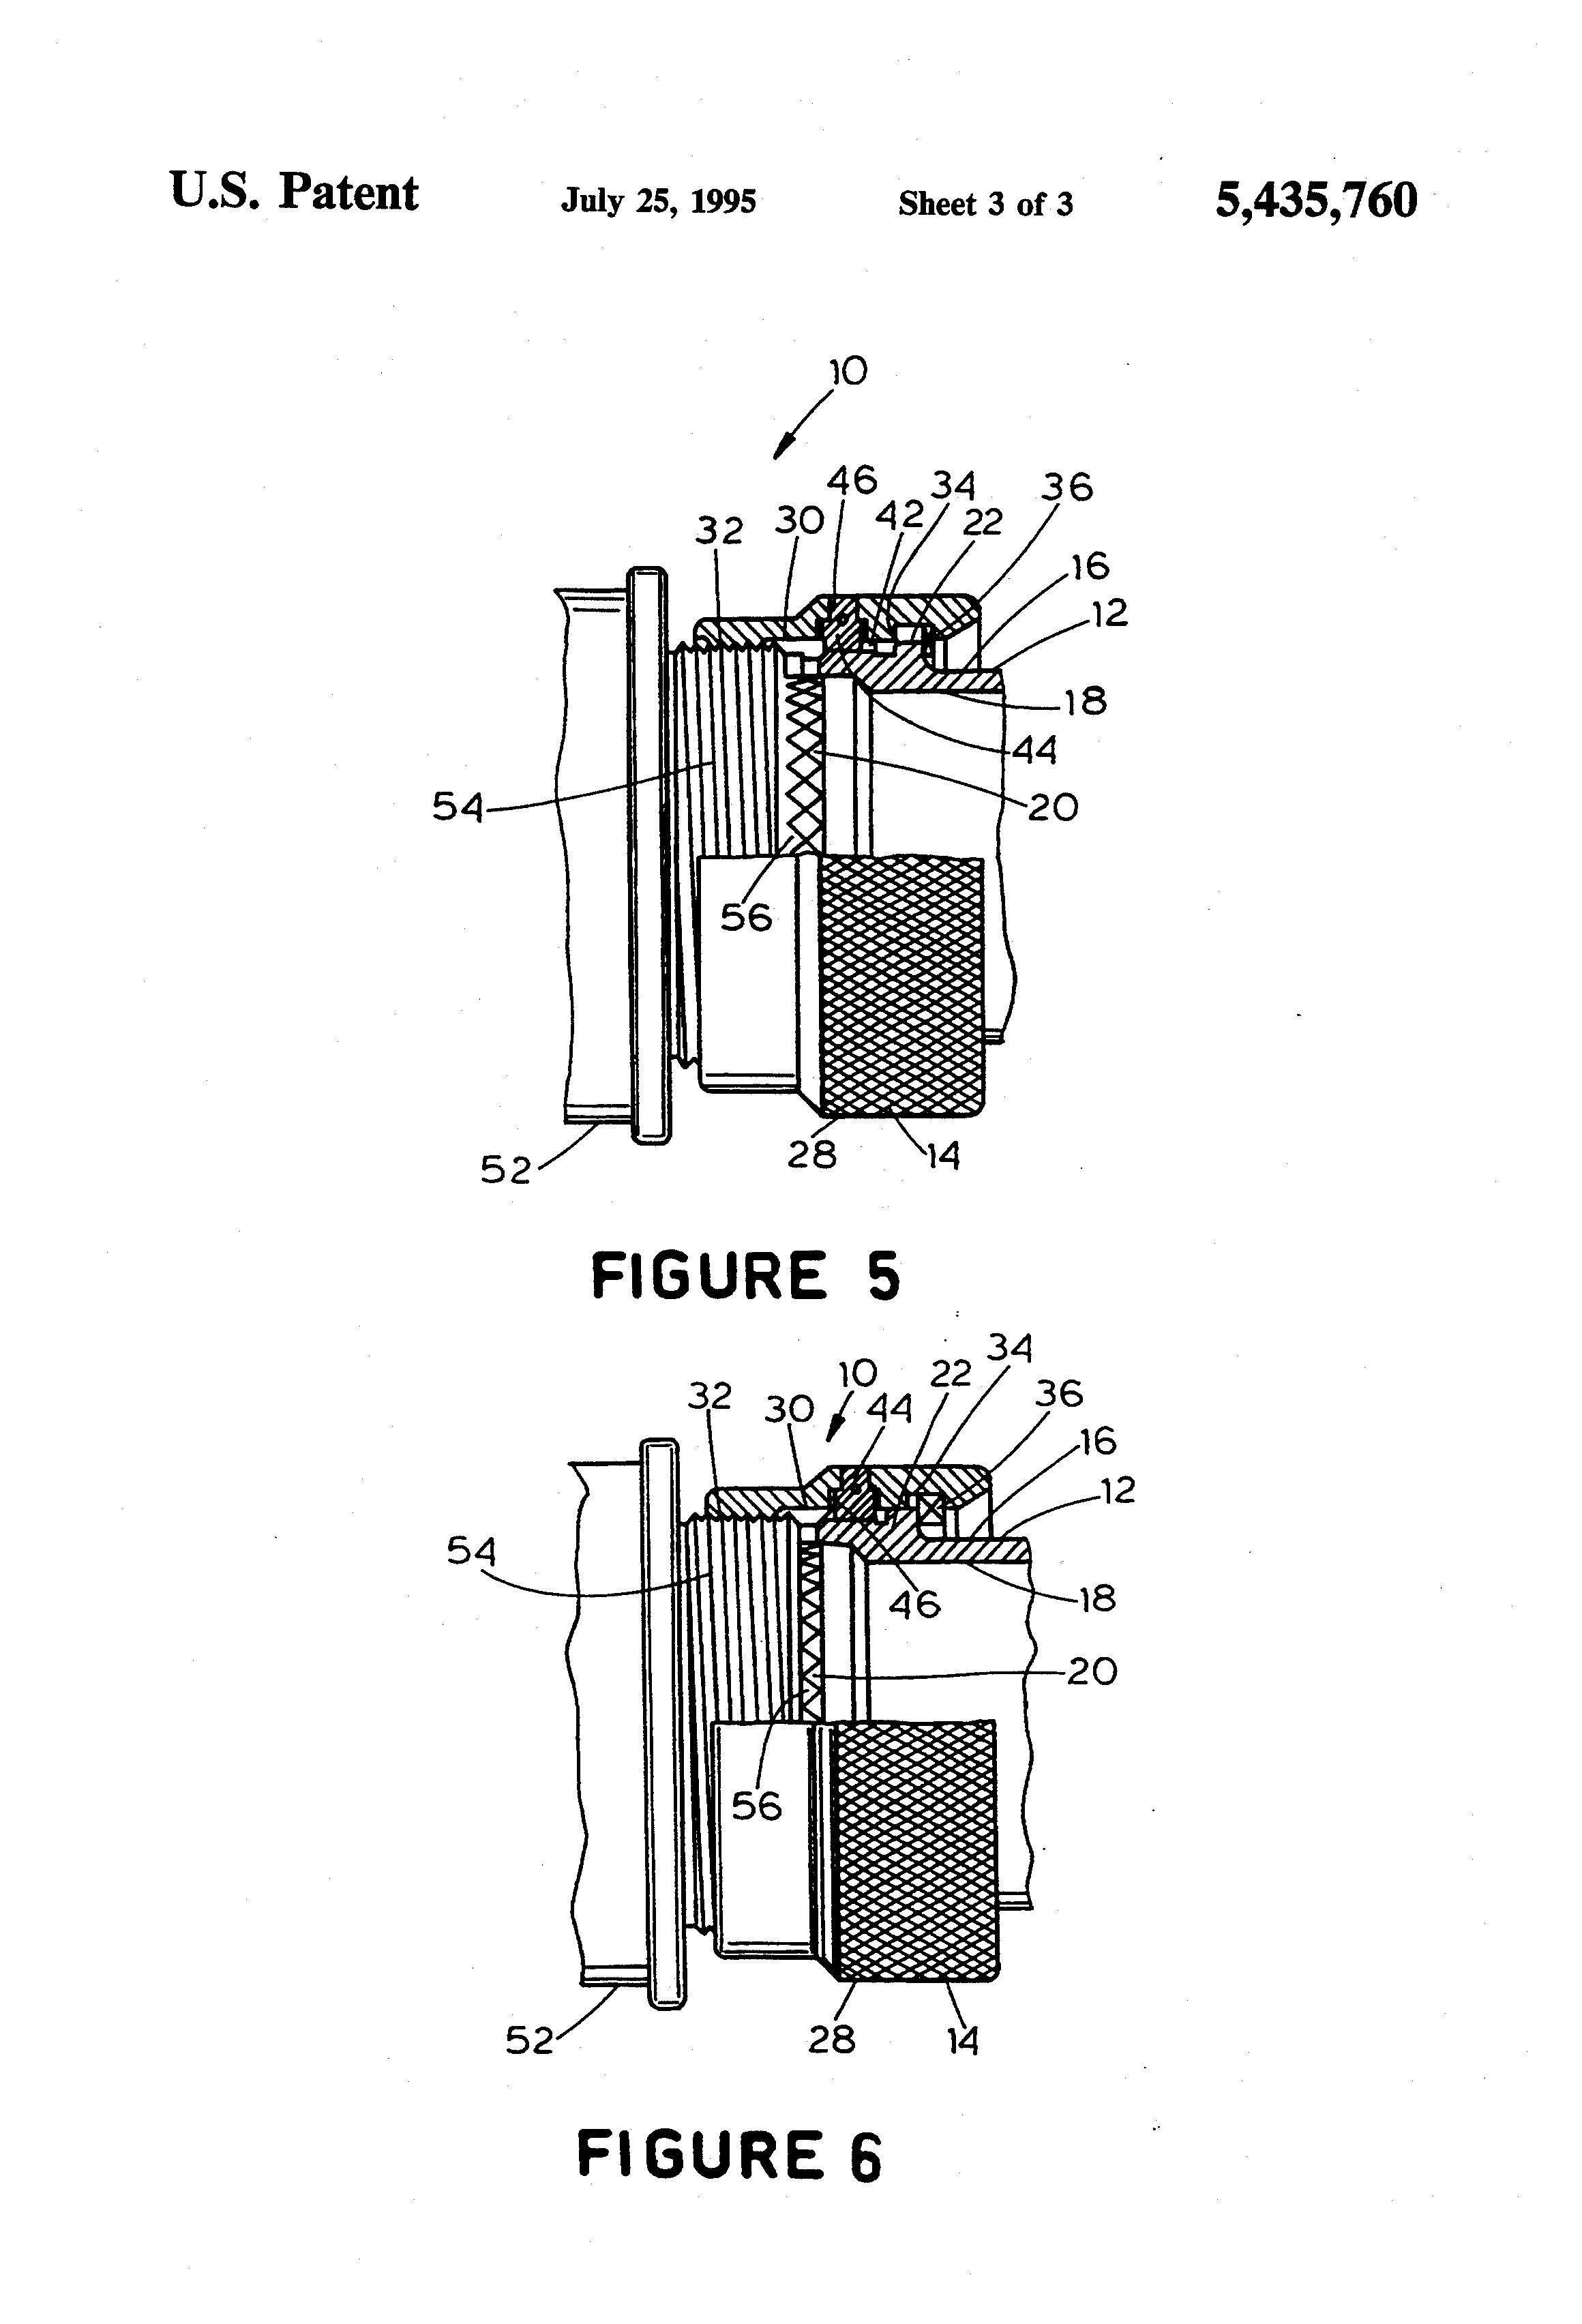 2001 Mercury Villager Fuse Box Diagram